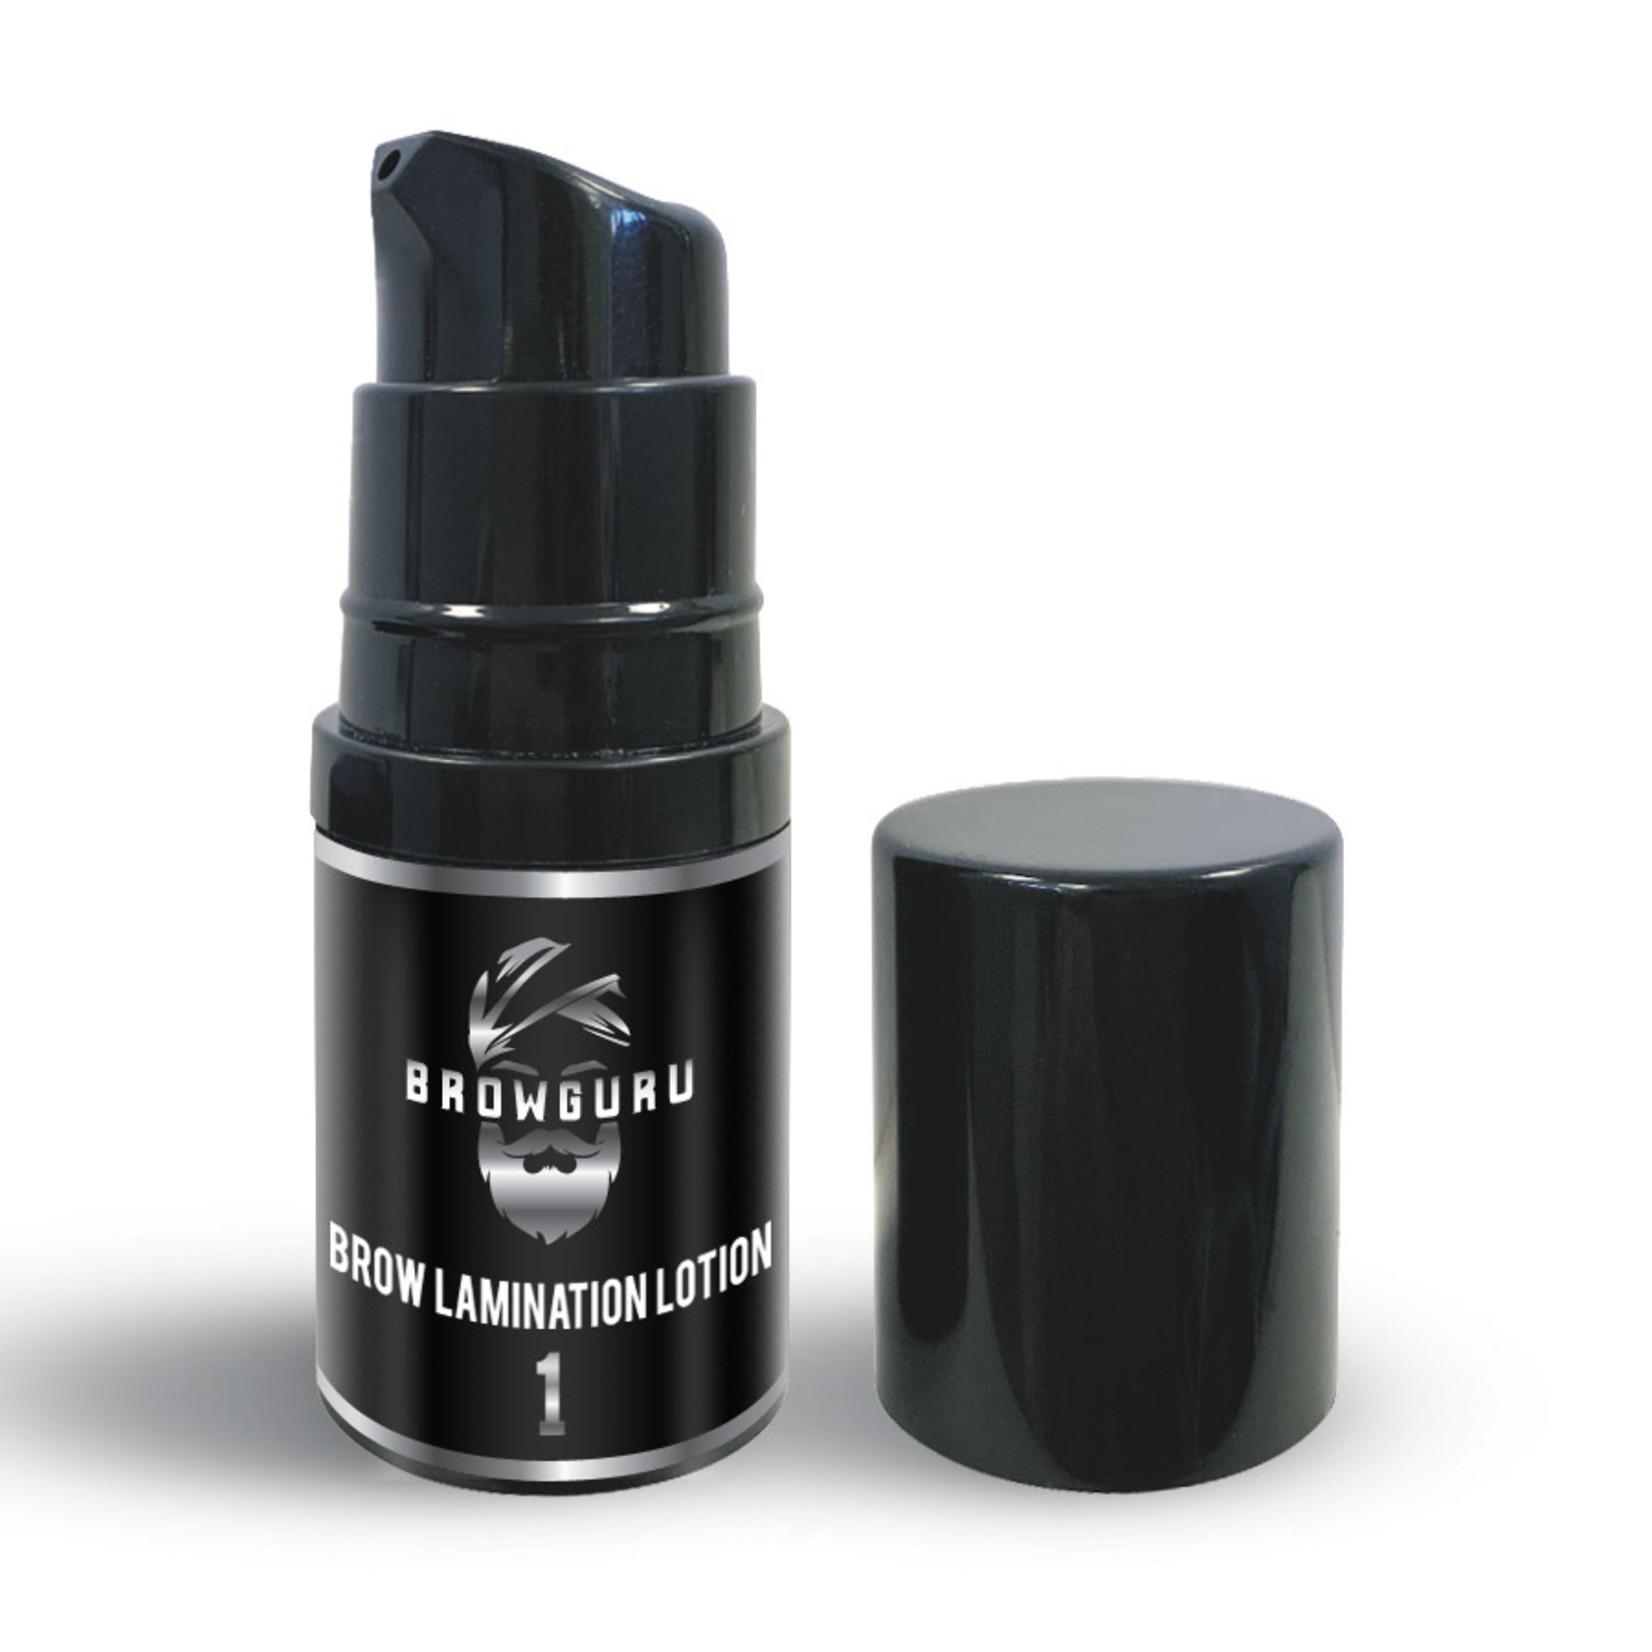 Browguru® Browlamination Salon Starterset